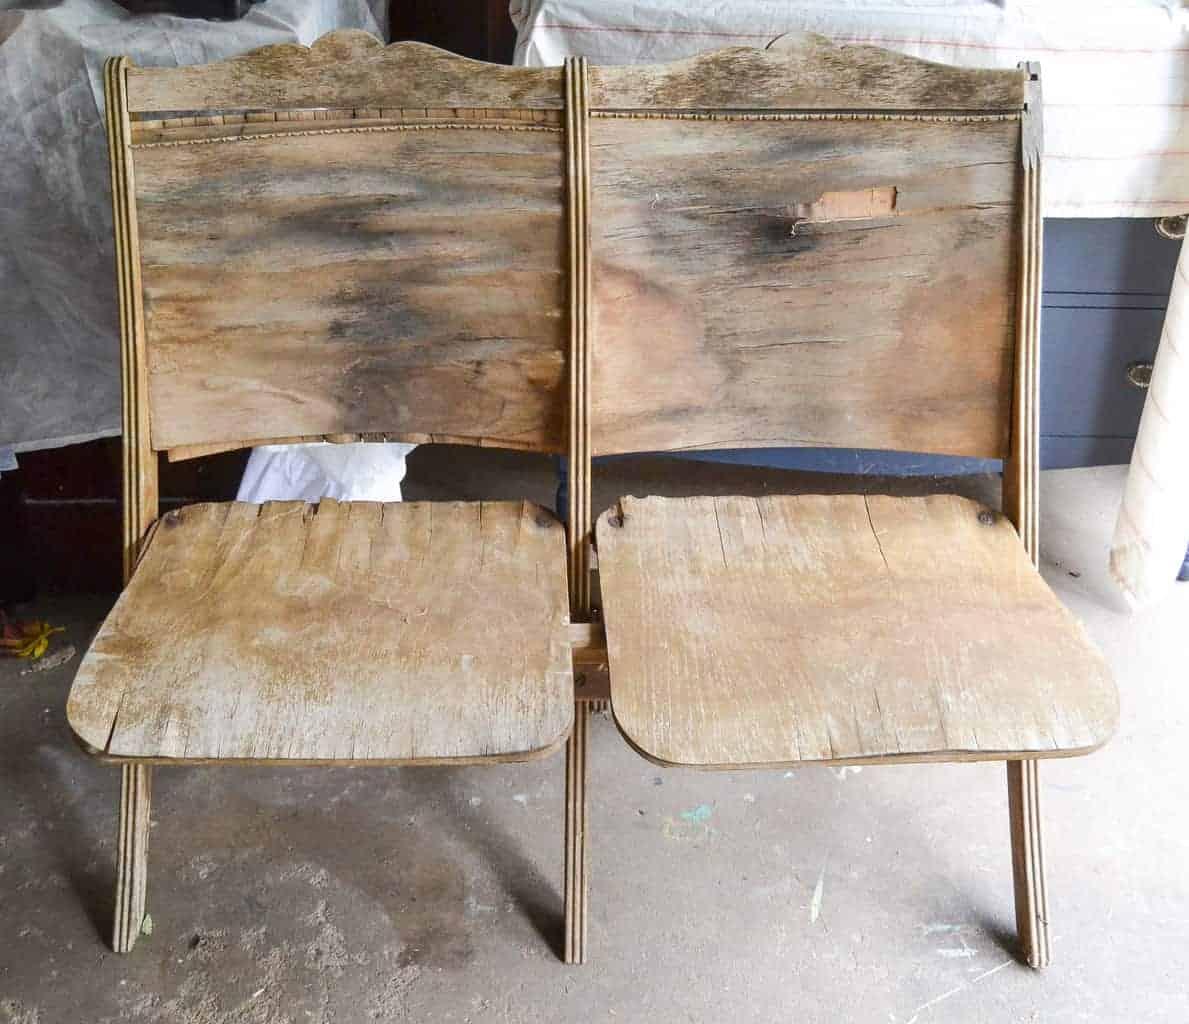 diy repurposed furniture. Pin This · Repurposed Chairs - Turn Vintage Theater Seats Into DIY Wall Decor. Diy Furniture